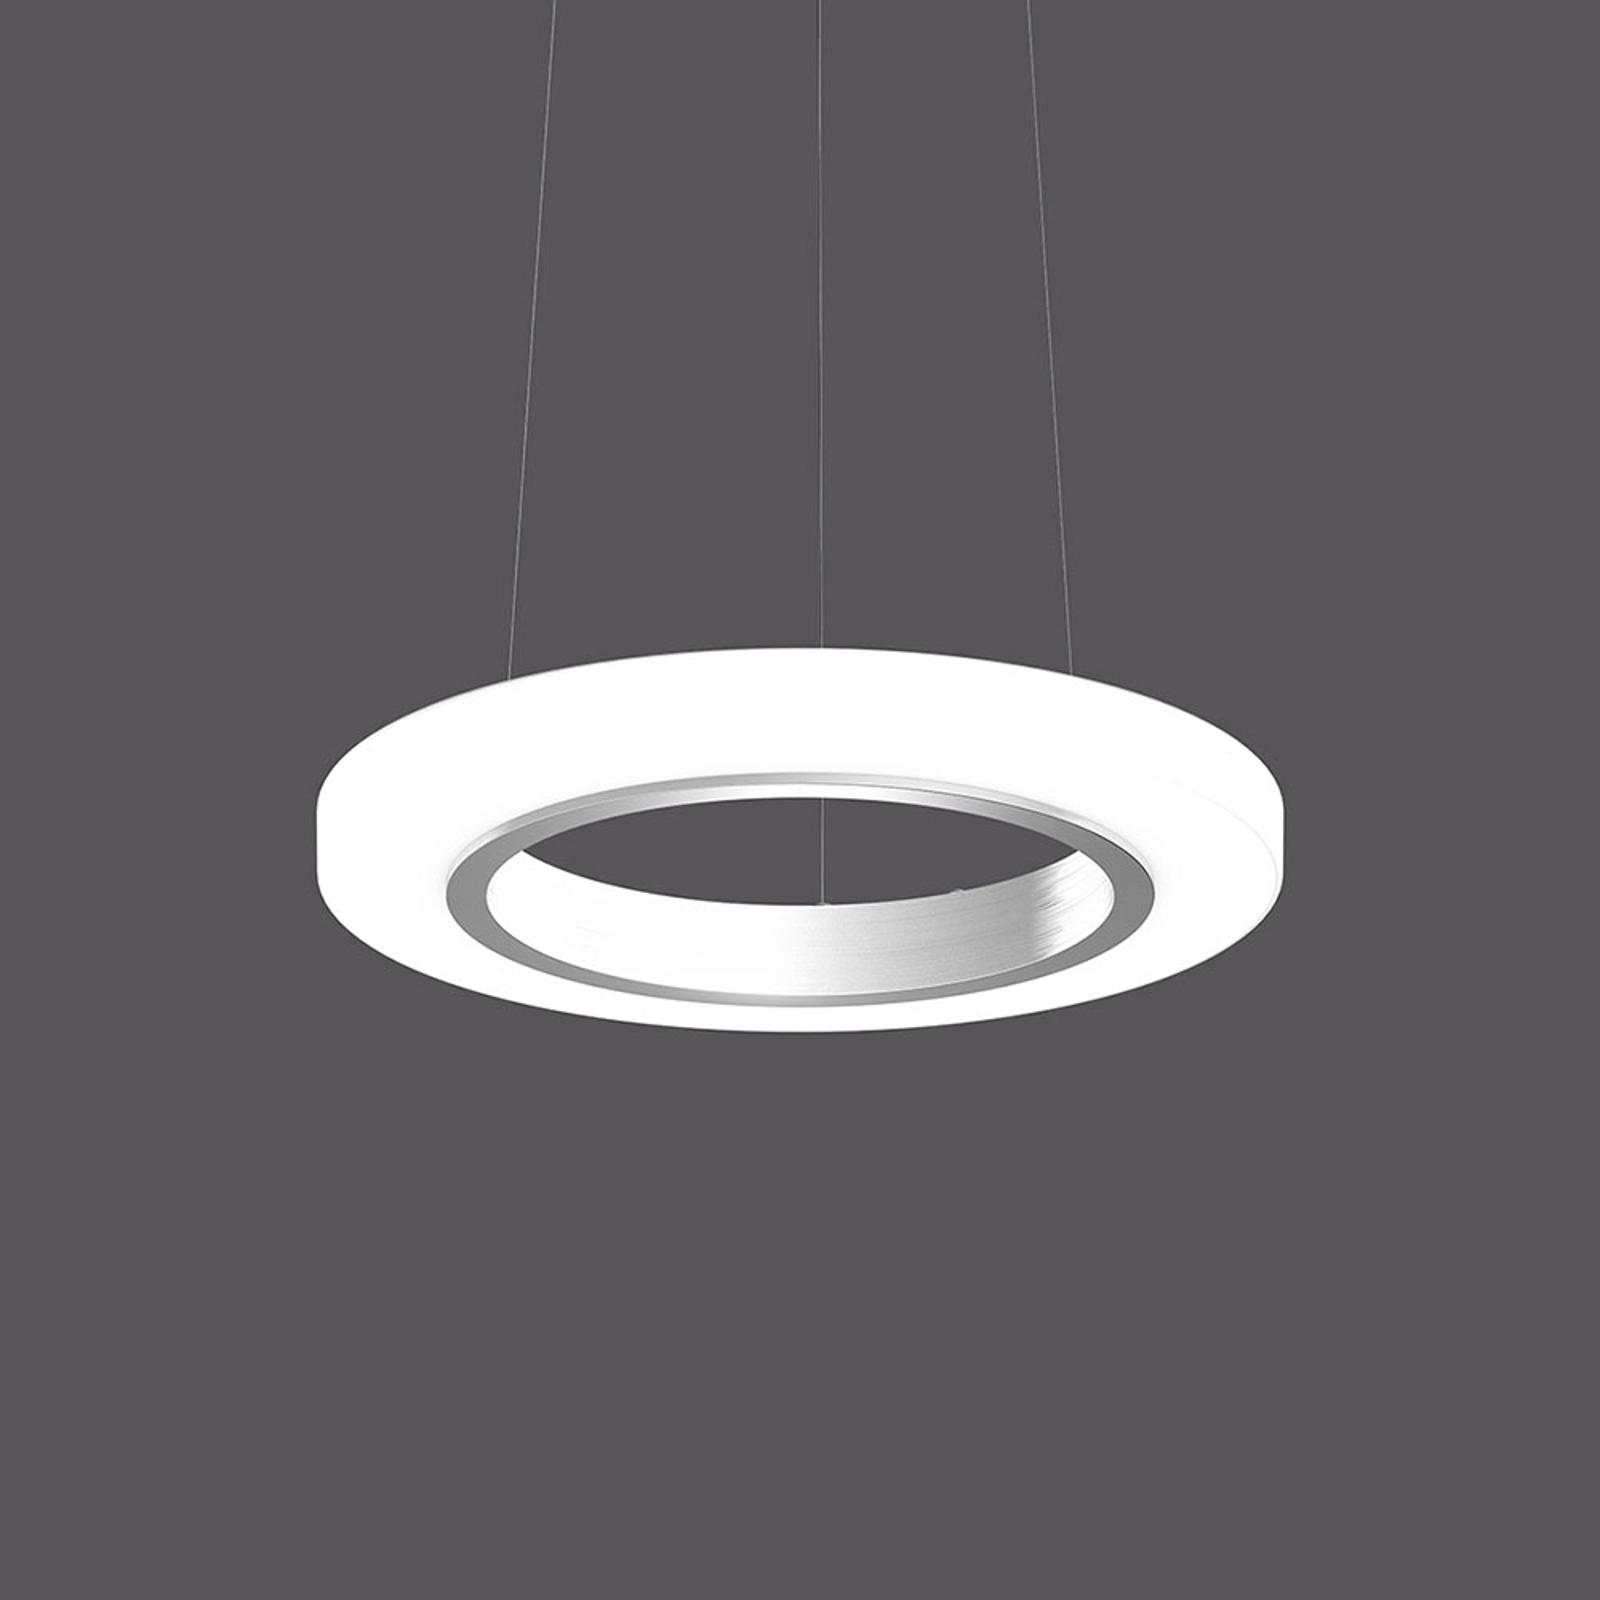 RZB Ring of Fire Pendel Zylinder DALI 50cm 30W 840